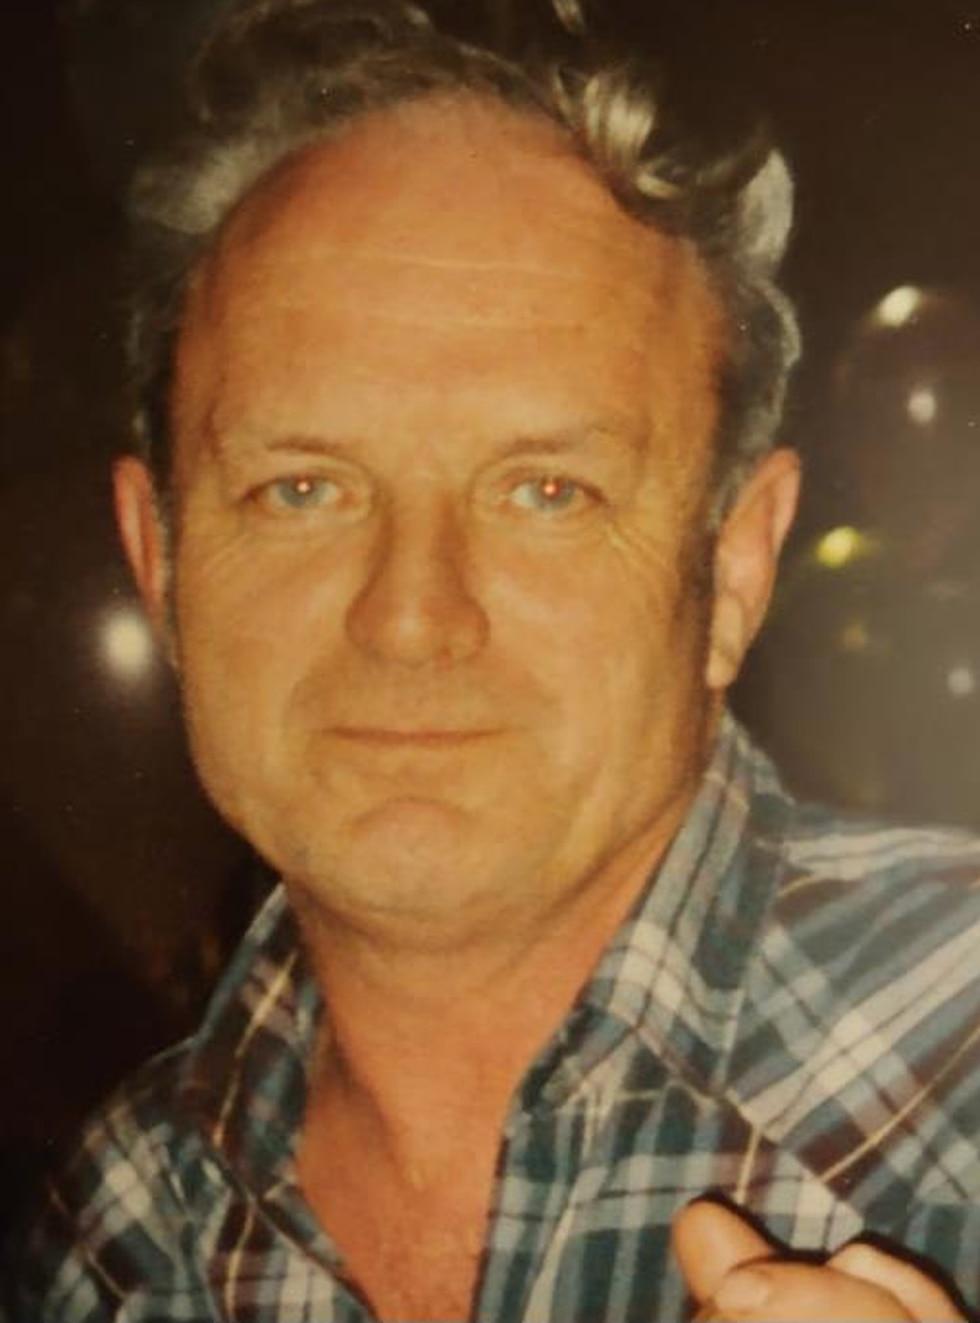 Charles George McGrath, 82, Adams, died October 9, 2021, at St. Luke's Hospital in Utica NY...